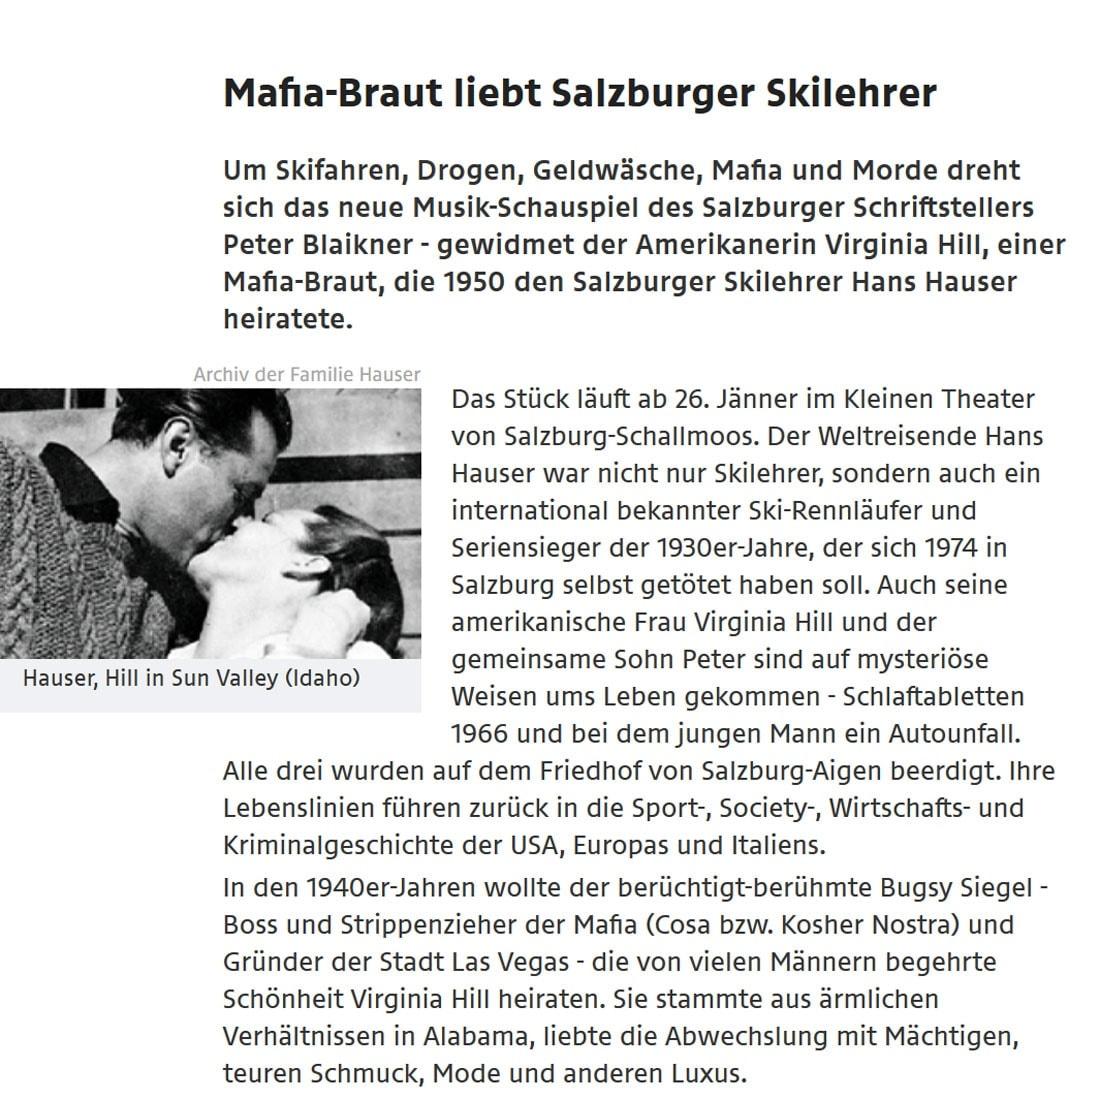 20180126 virginiahill orf 01 - Mafia-Braut liebt Salzburger Skilehrer - salzburg.orf.at vom 26.01.2018